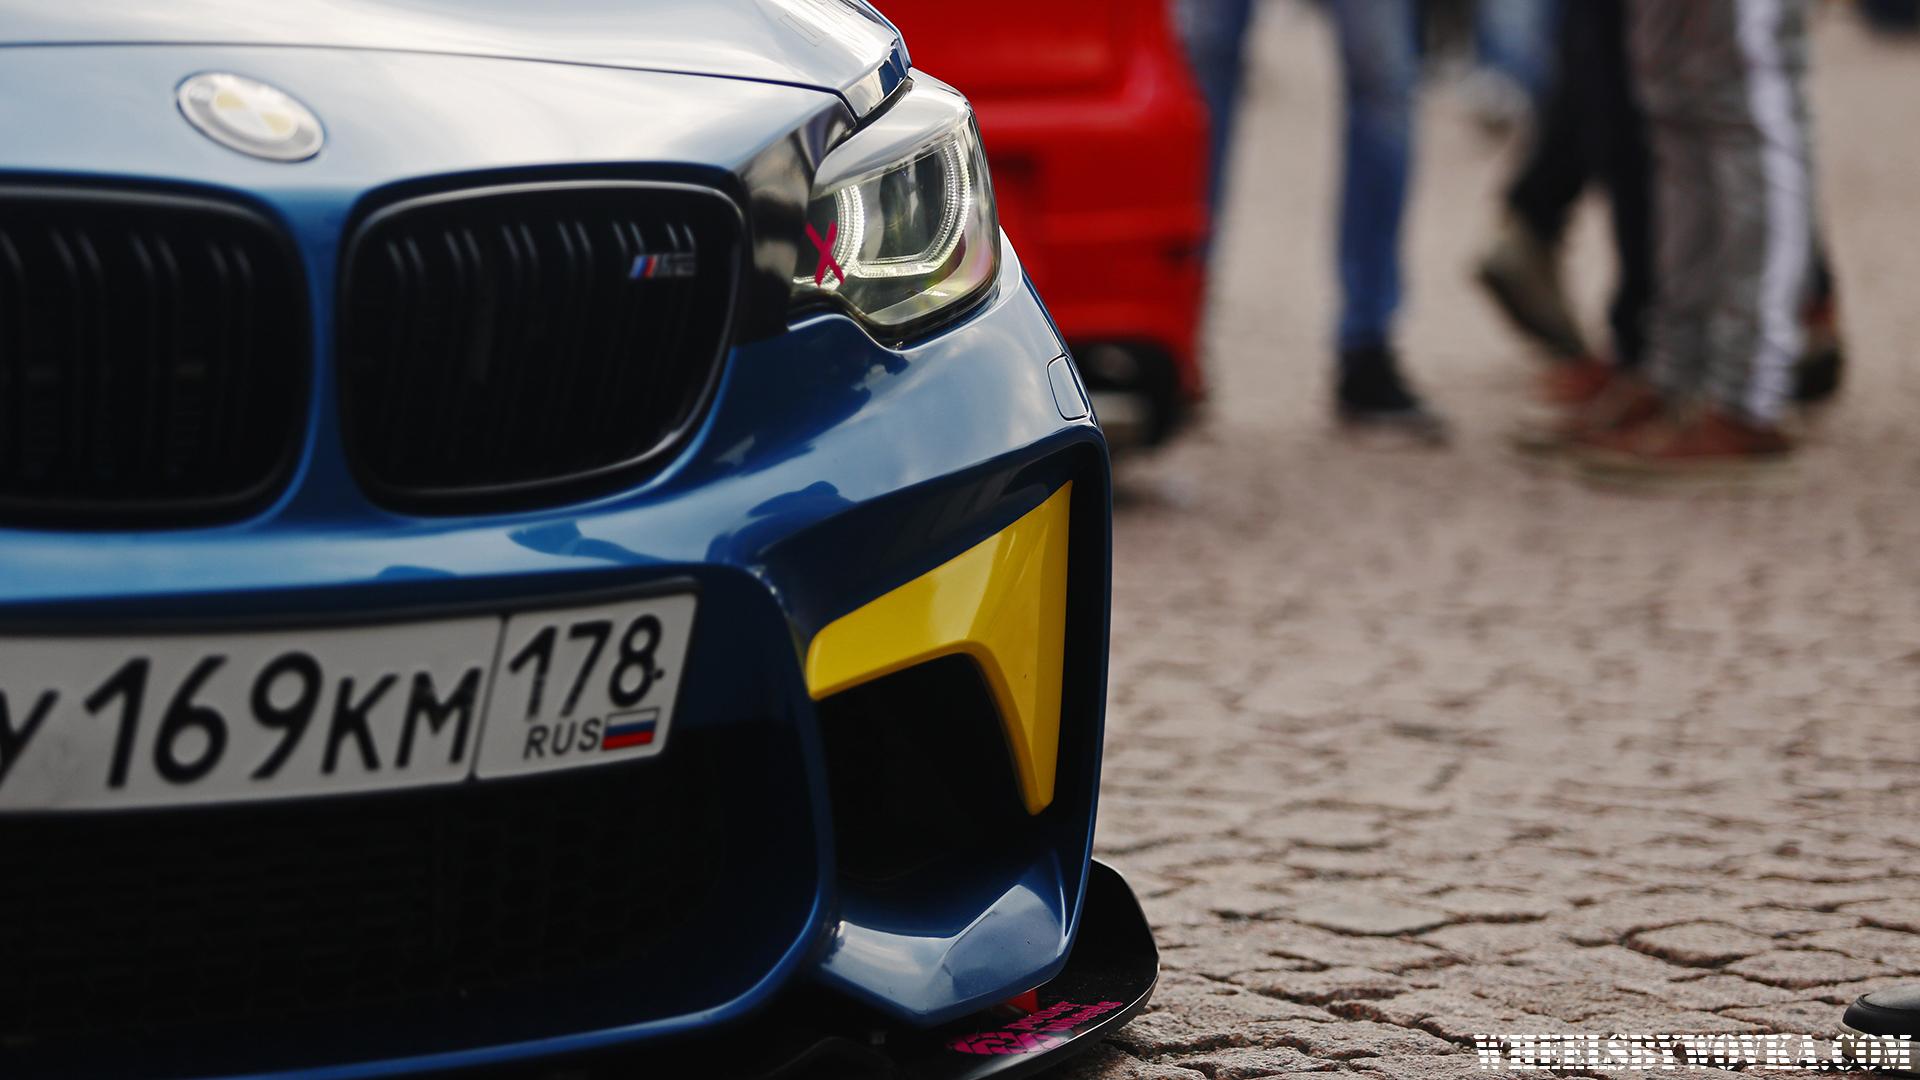 fitted-fest-lahti-finland-cdlcco-2018-by-wheelsbywovka-52